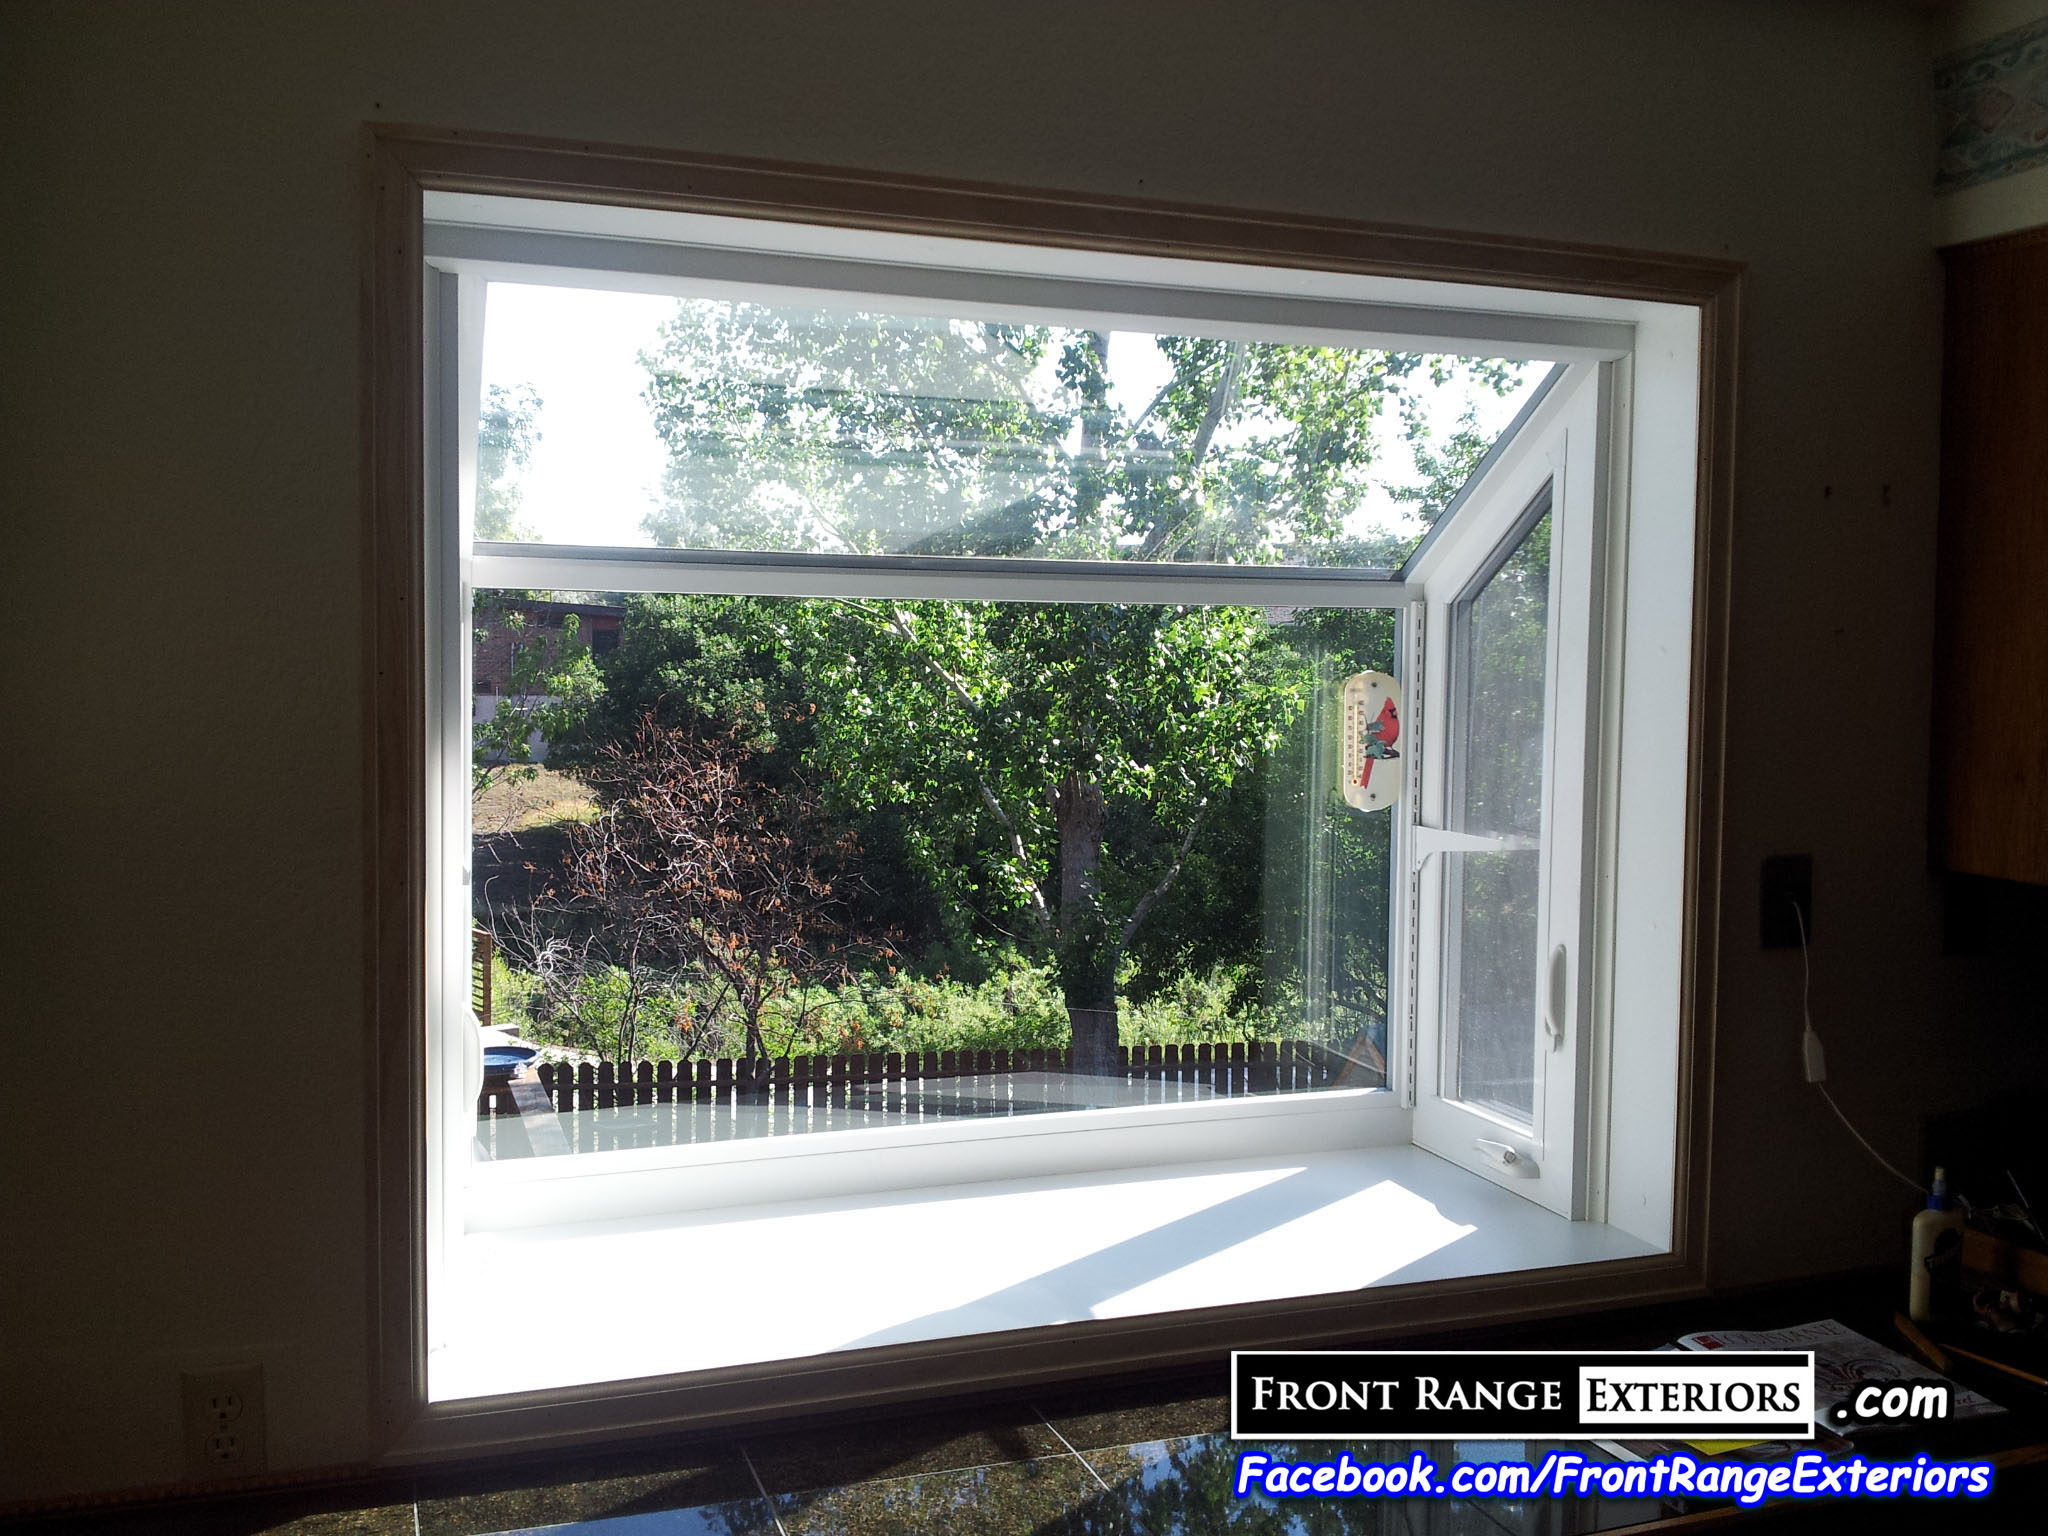 Colorado Springs Replacement Windows Bay Window Garden Box Front